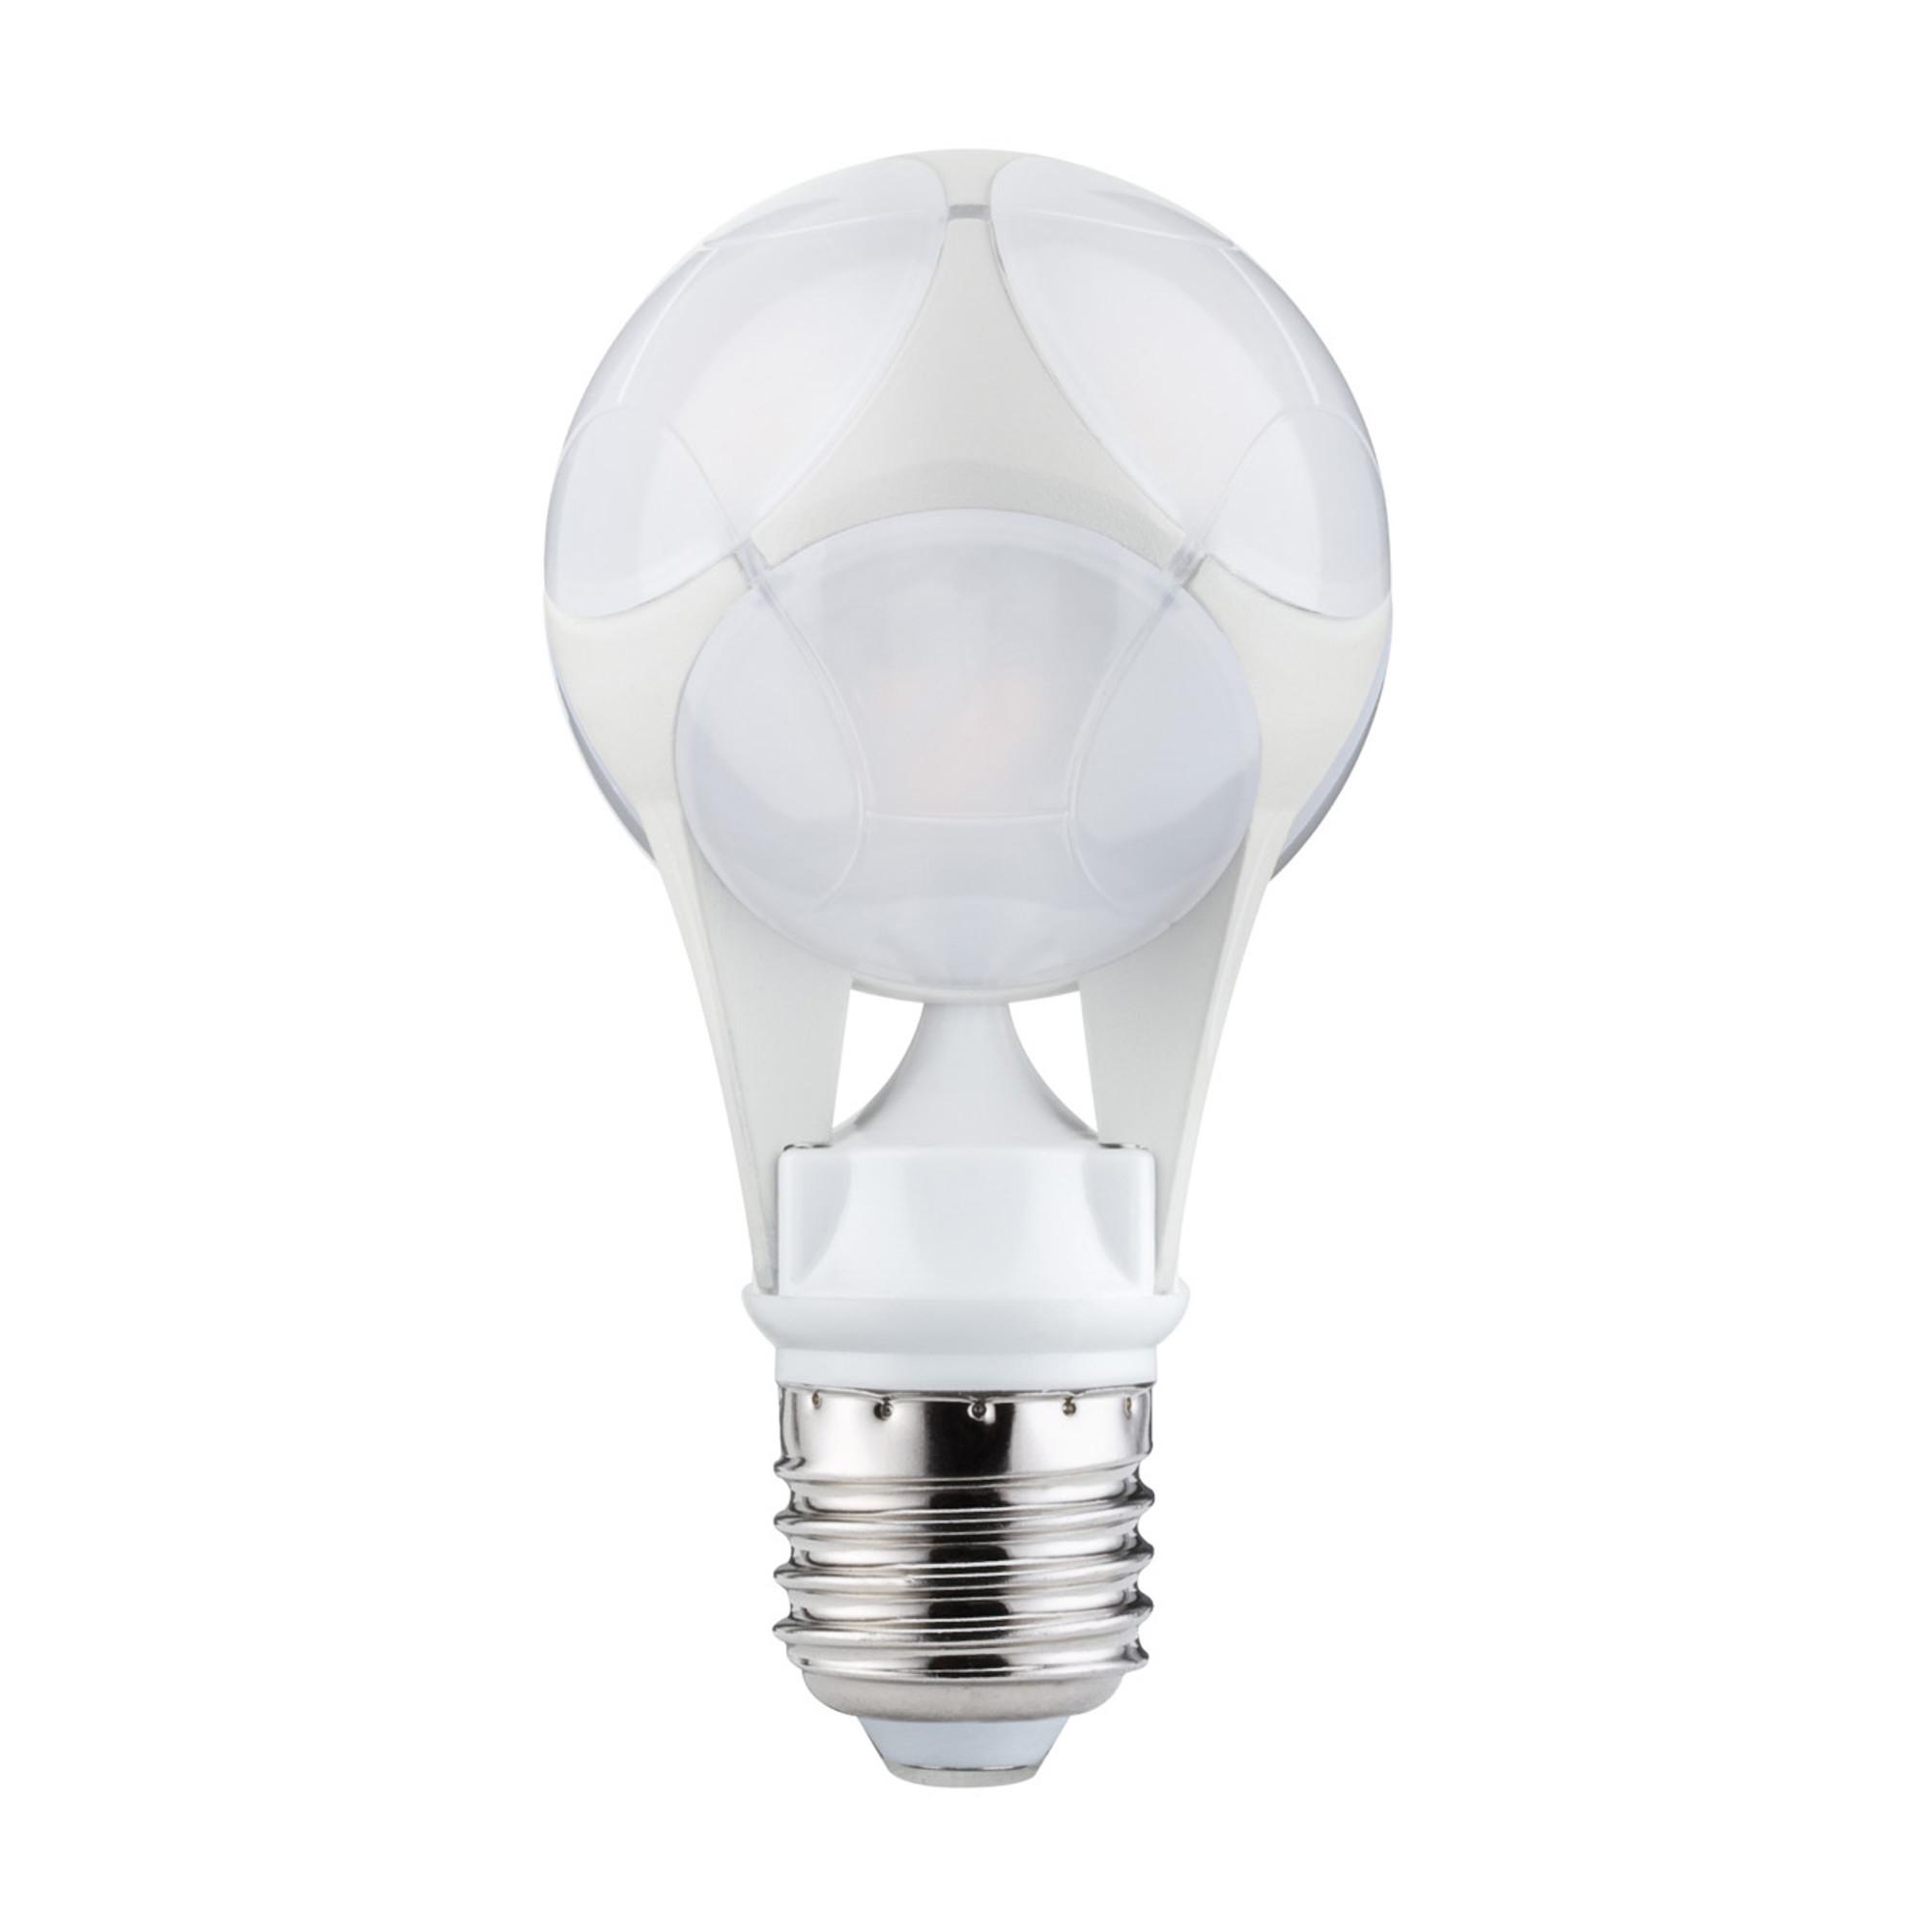 Лампа светодиодная Paulmann 28222 E27 806 Лм теплый свет